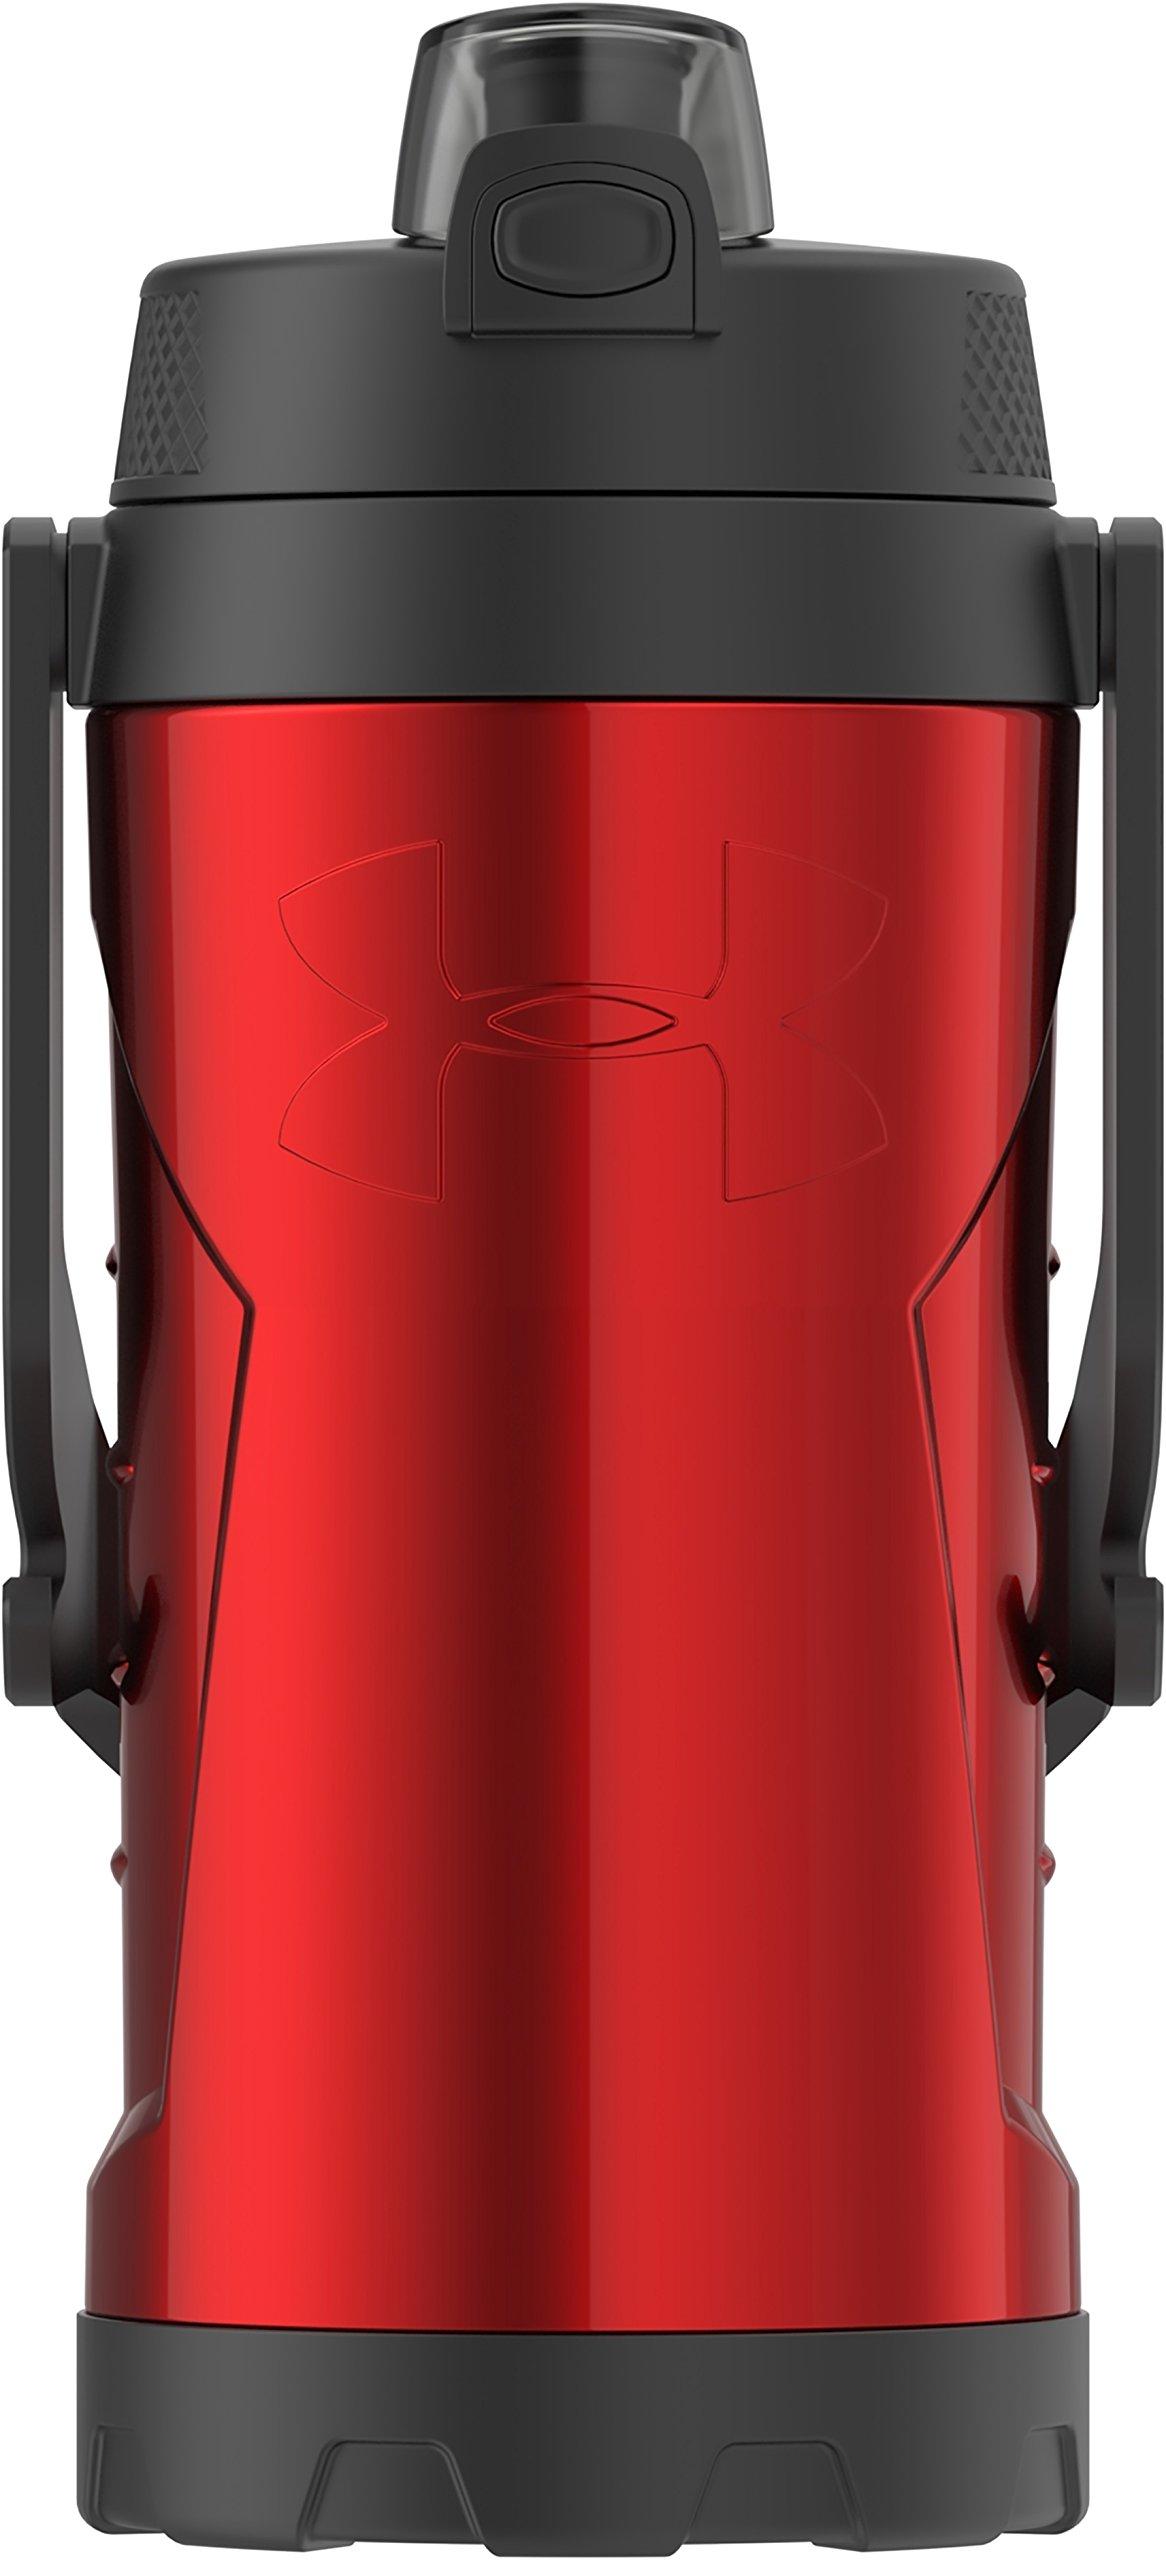 Under Armour MVP 2 Liter Stainless Steel Water Bottle, Matte Red